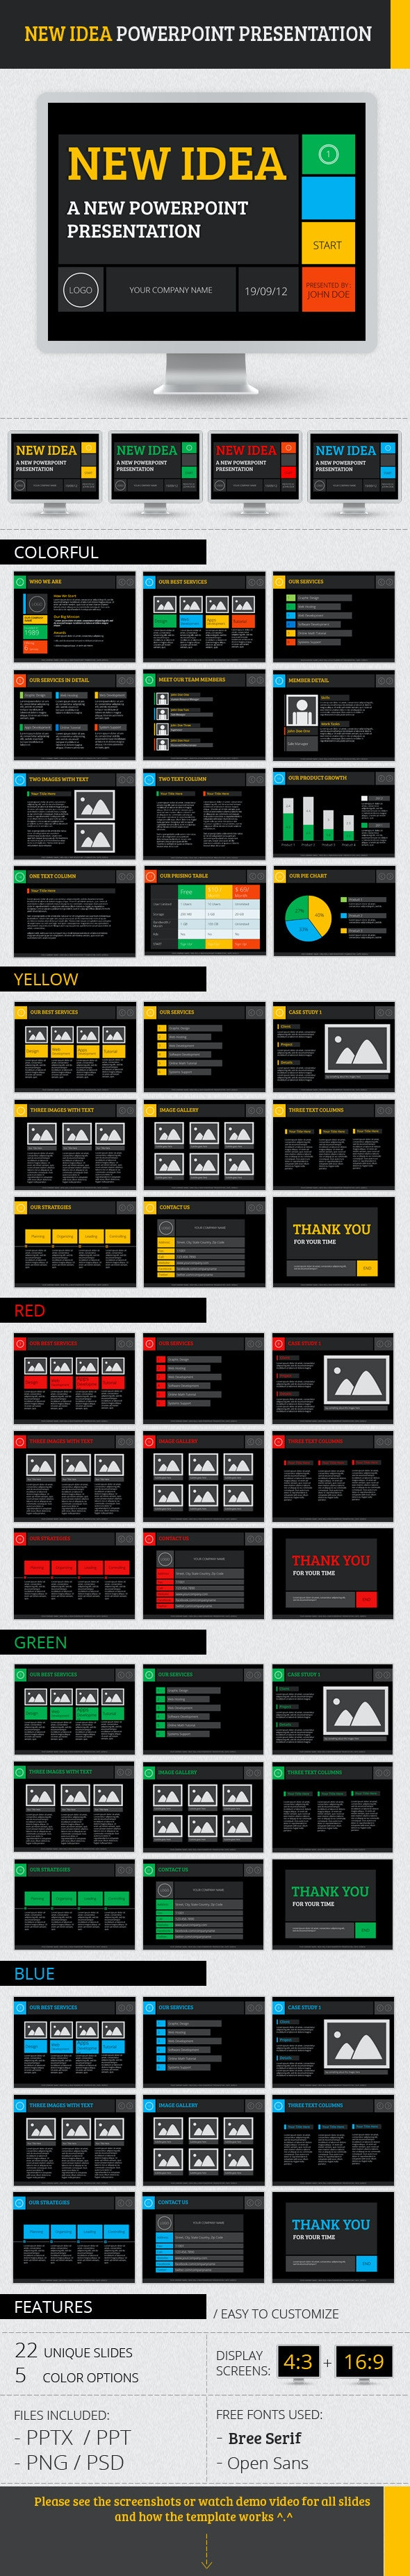 New Idea PowerPoint Presentation - PowerPoint Templates Presentation Templates